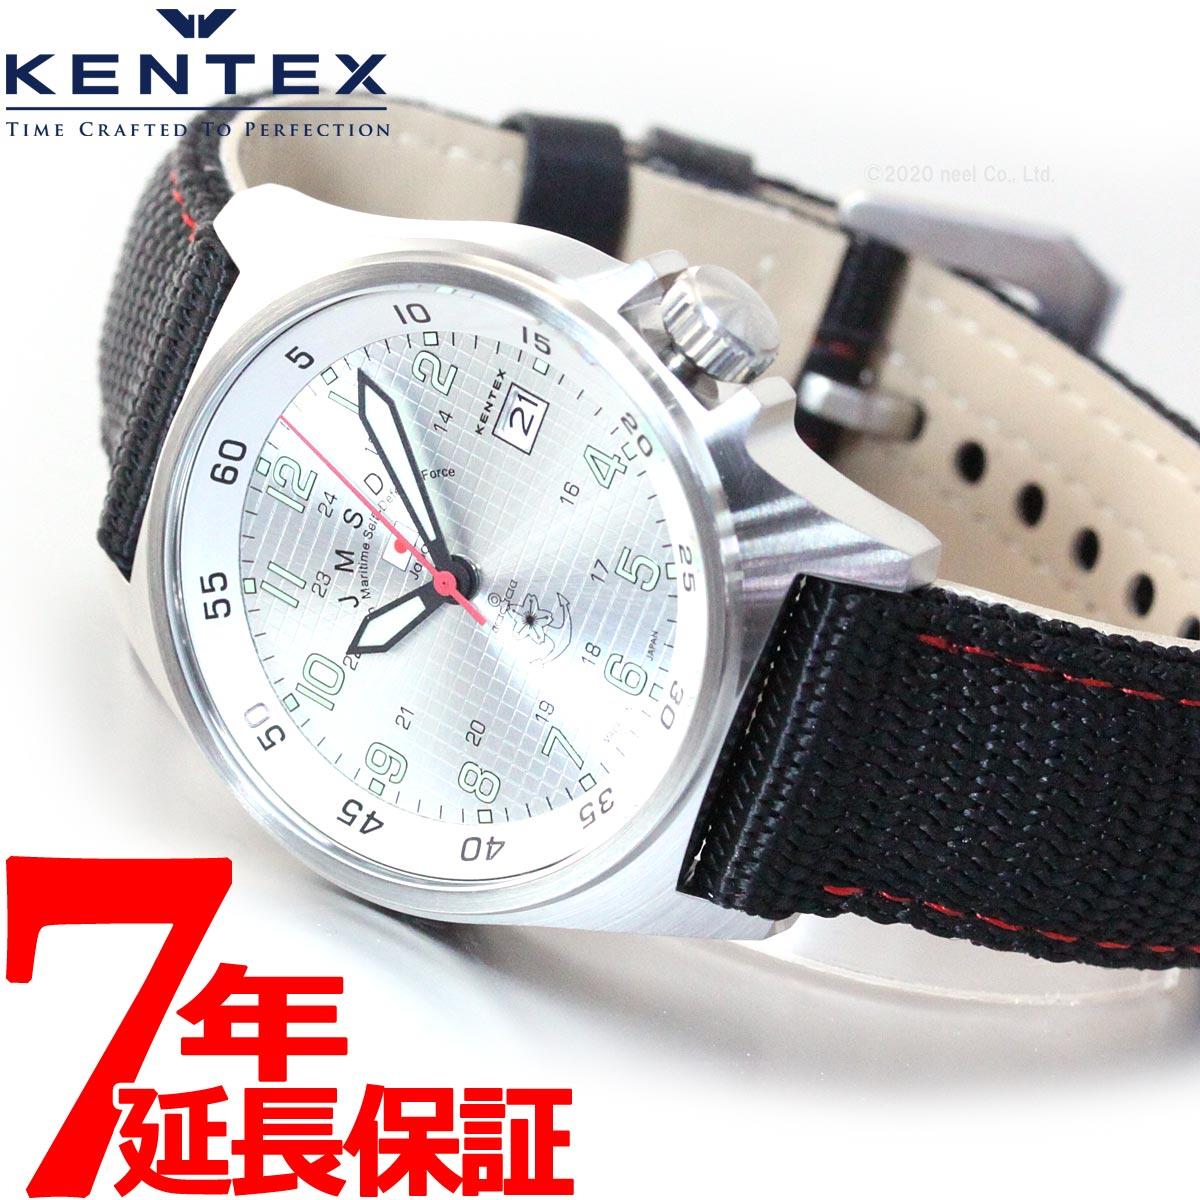 【SHOP OF THE YEAR 2018 受賞】KENTEX ケンテックス 腕時計 メンズ JSDF スタンダード 自衛隊モデル 海上自衛隊 ナイロンバンド S455M-03